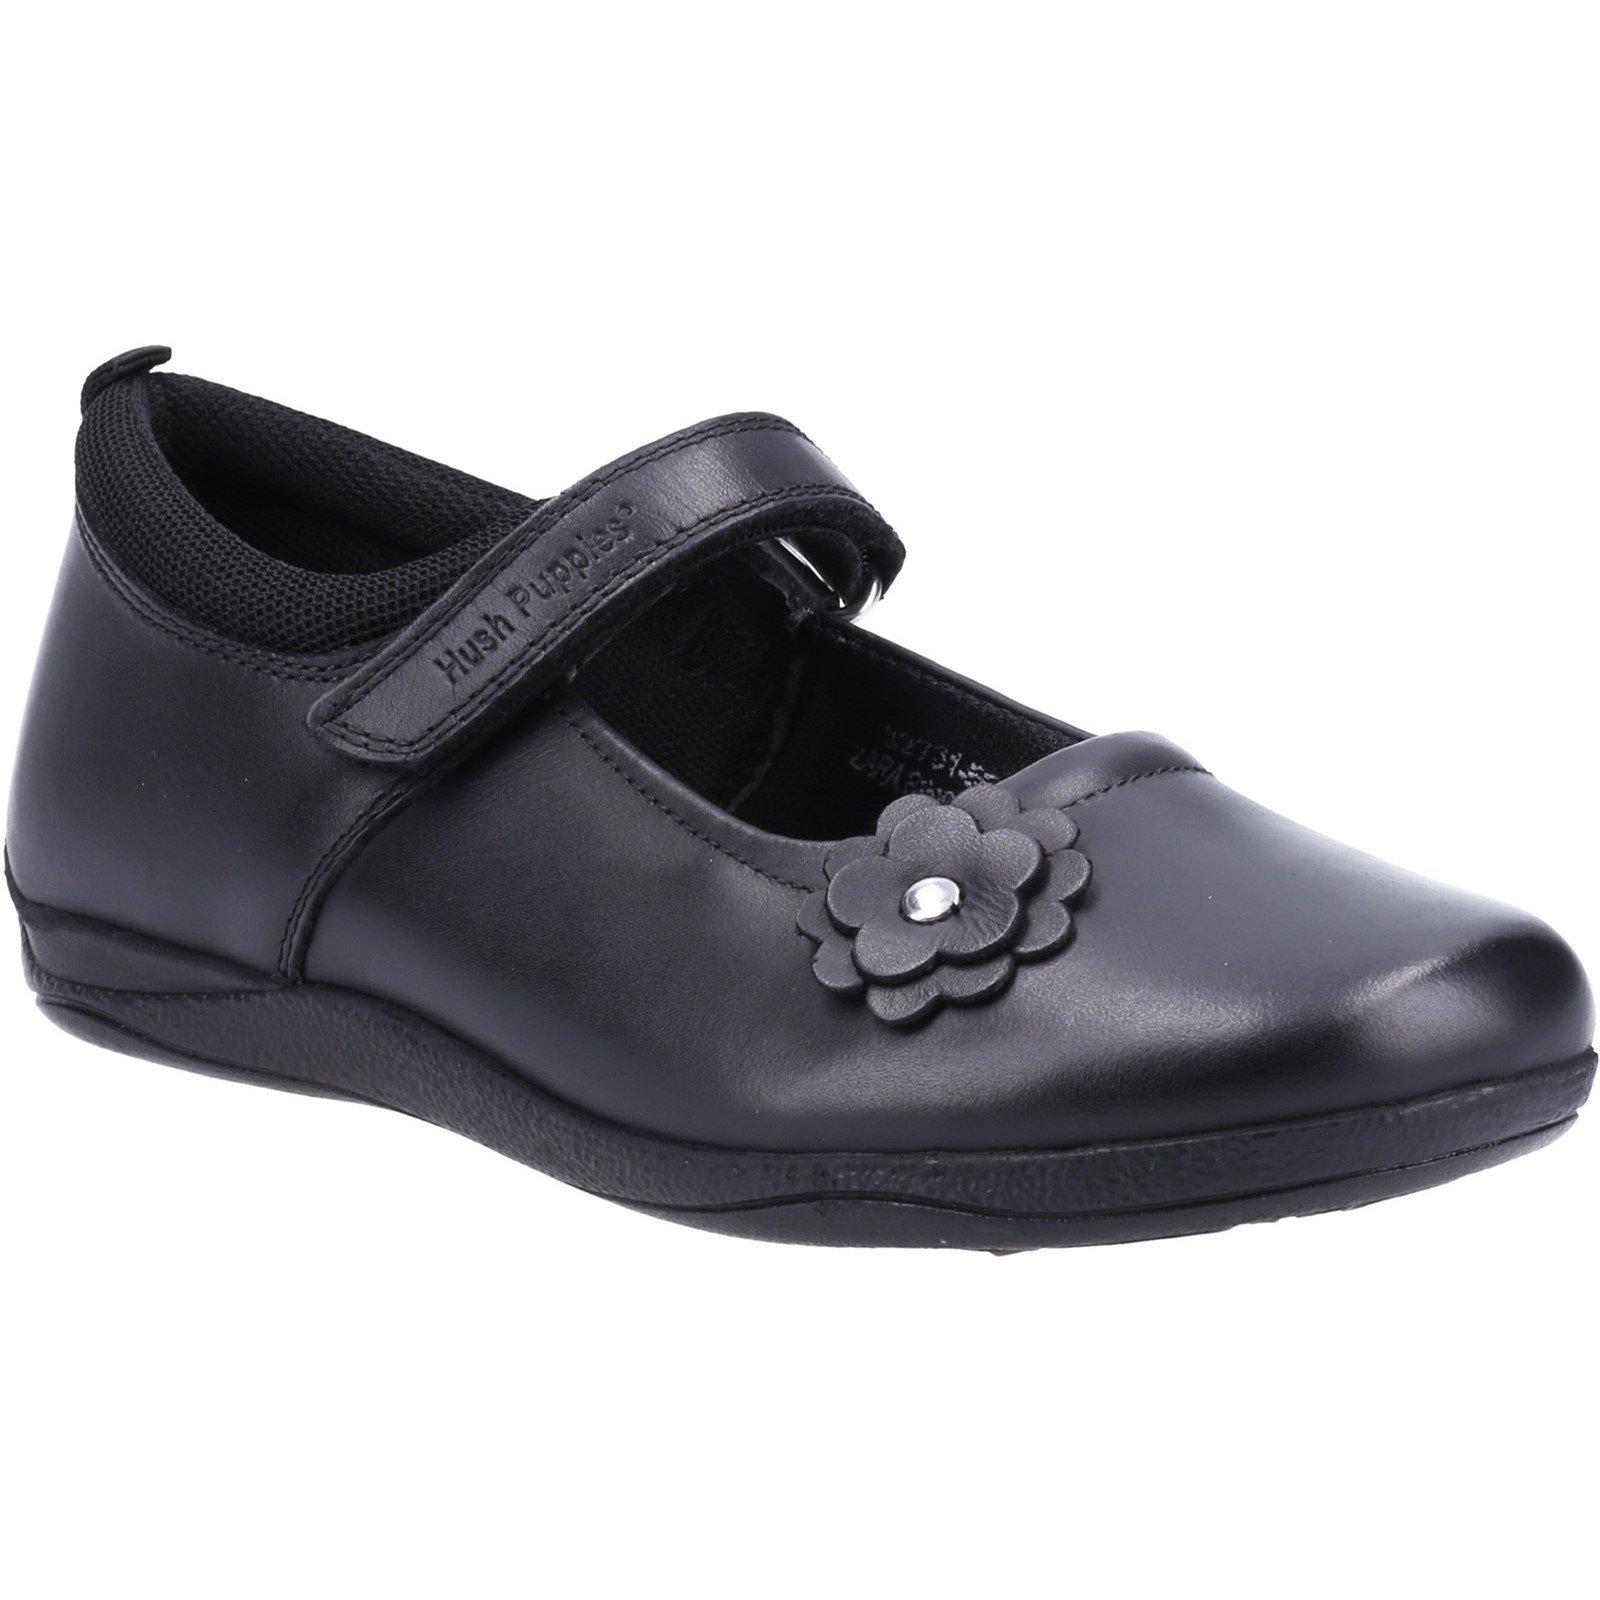 Hush Puppies Kid's Zara Junior School Flat Shoe Black 32731 - Black 13